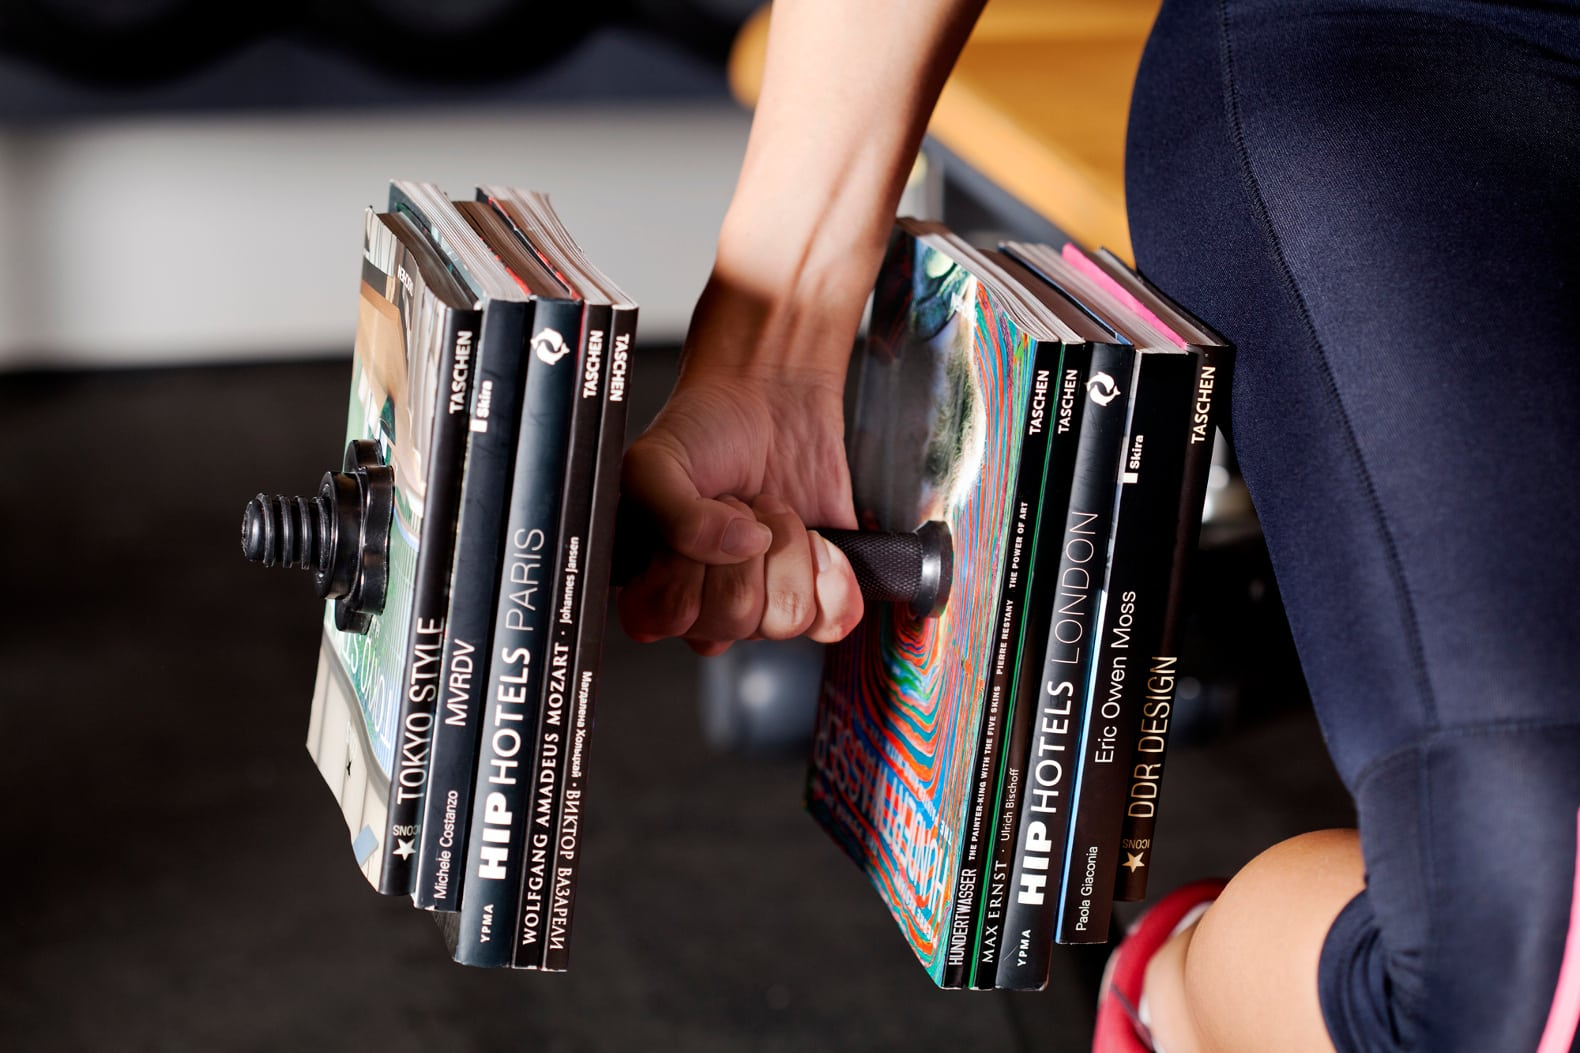 Mundo maromba incentivo à leitura